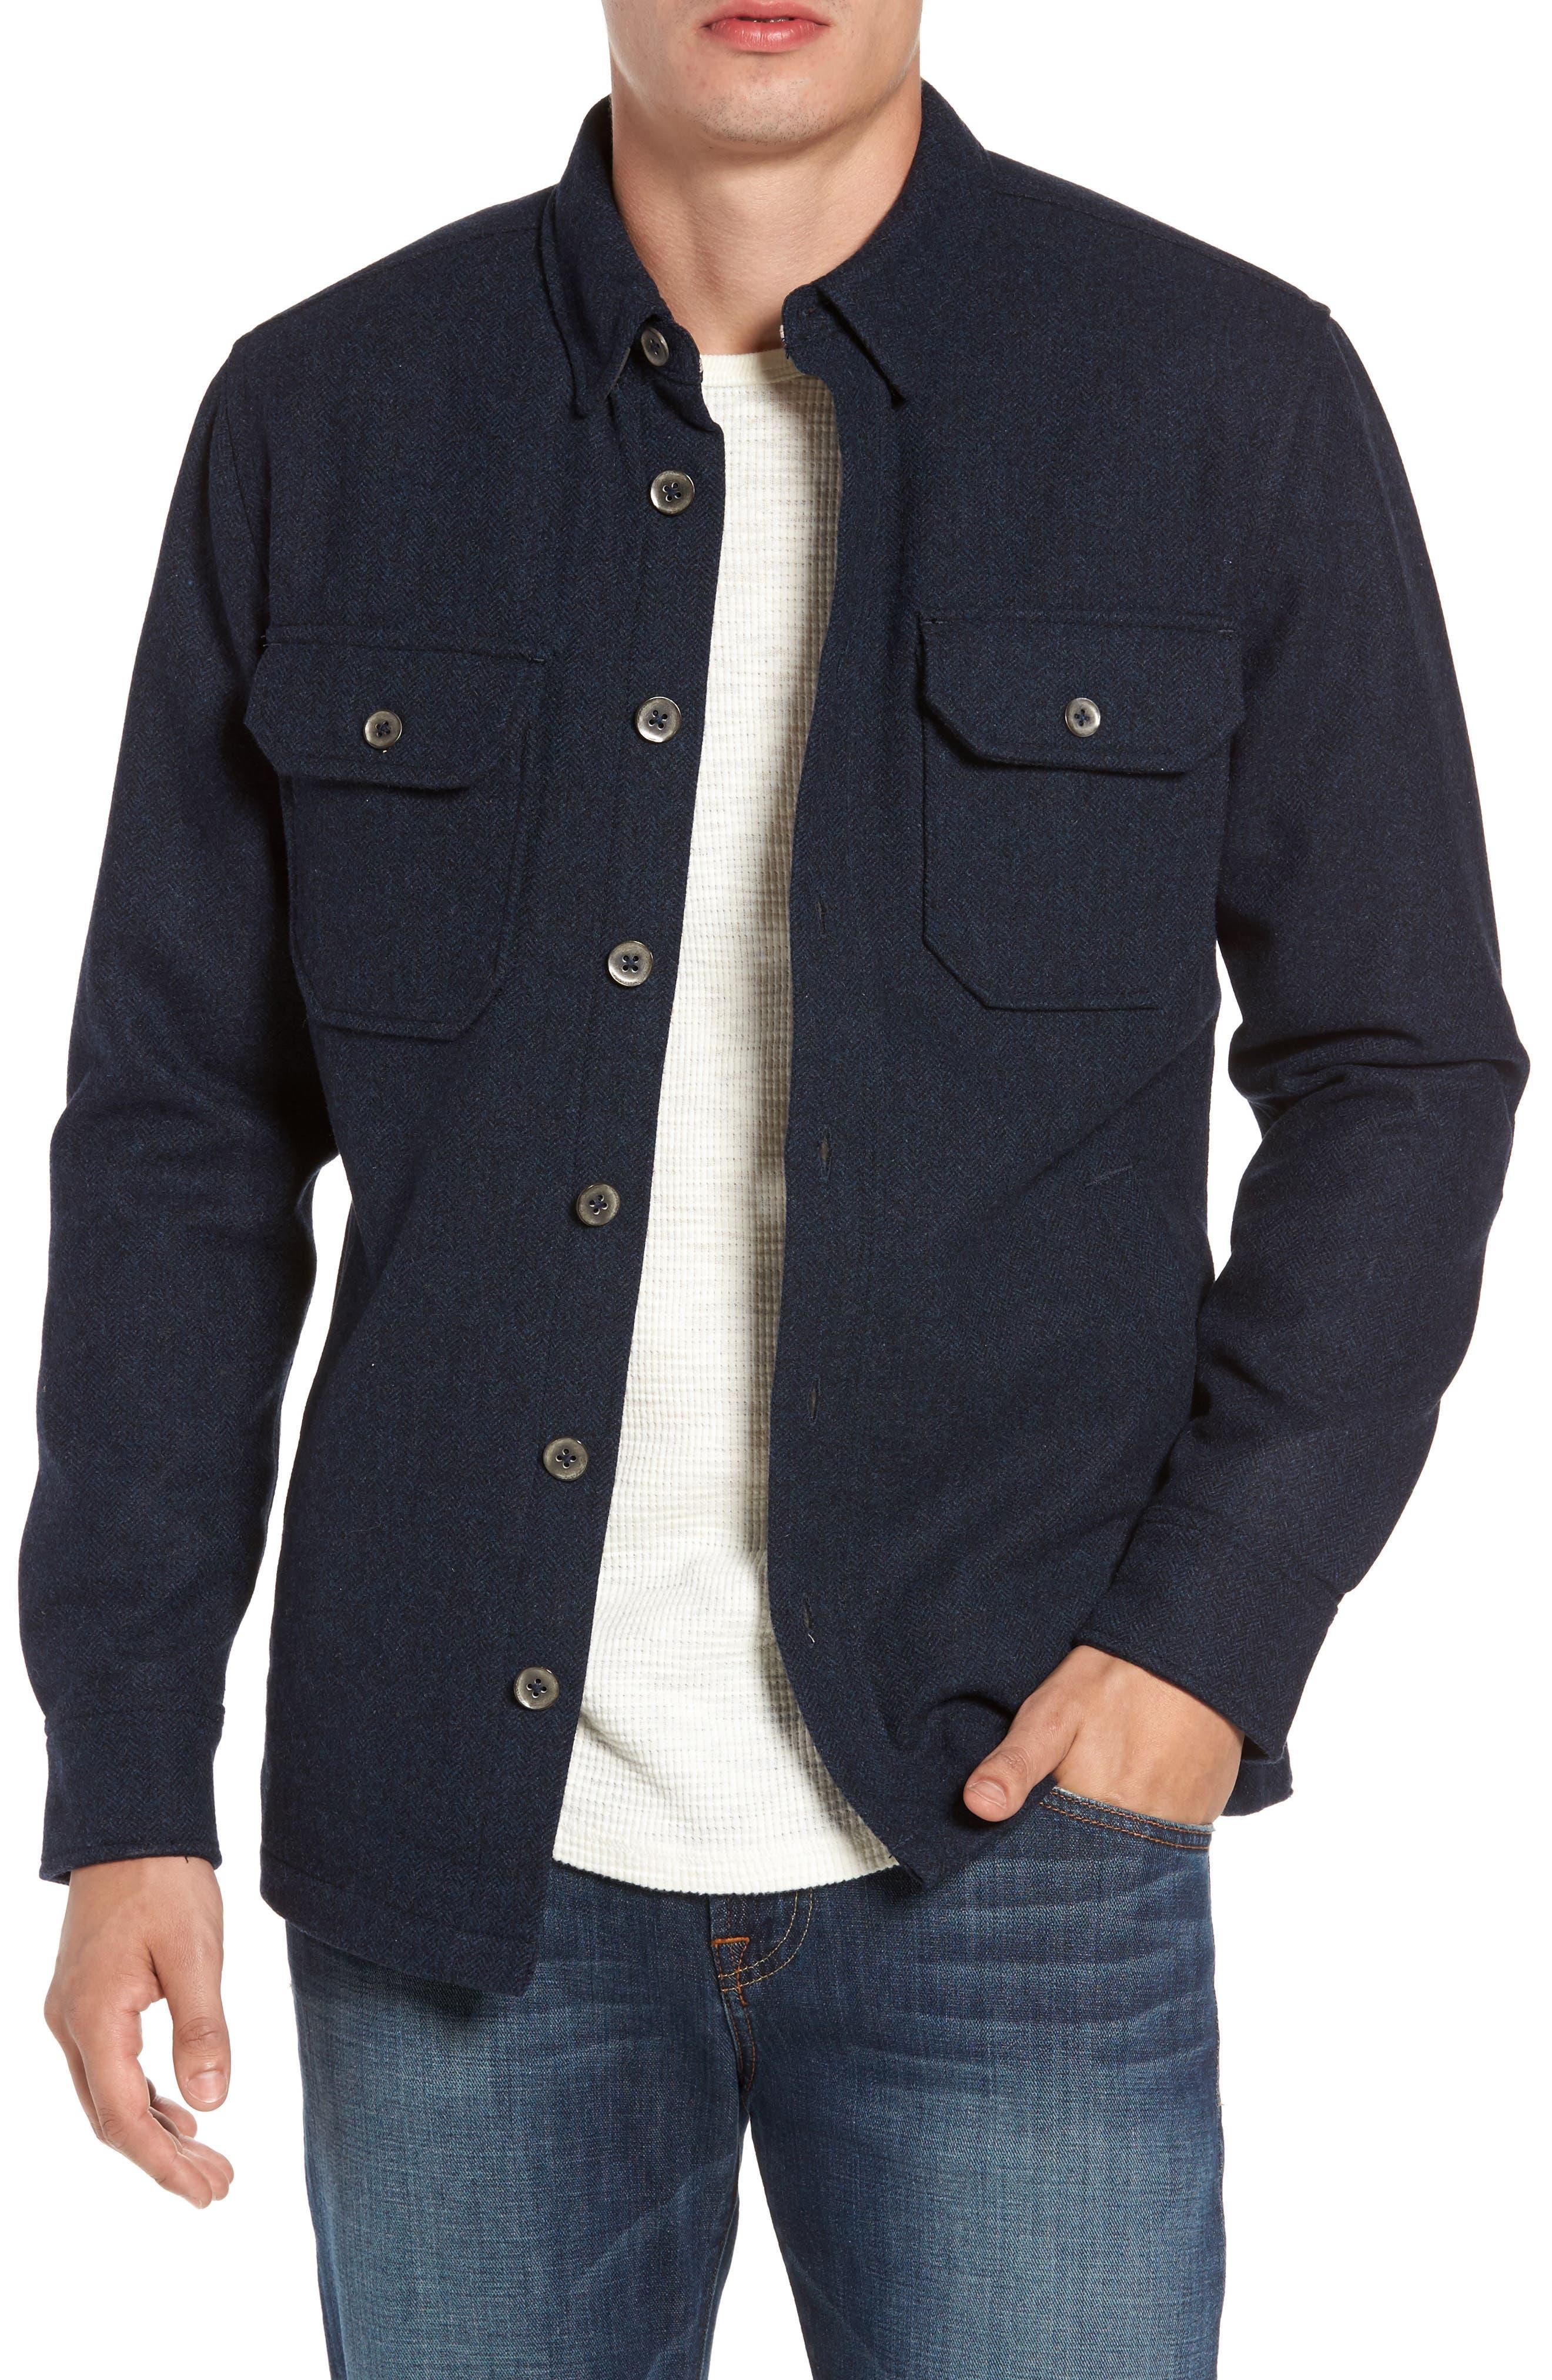 Alternate Image 1 Selected - Jeremiah Creek Herringbone Wool Shirt Jacket